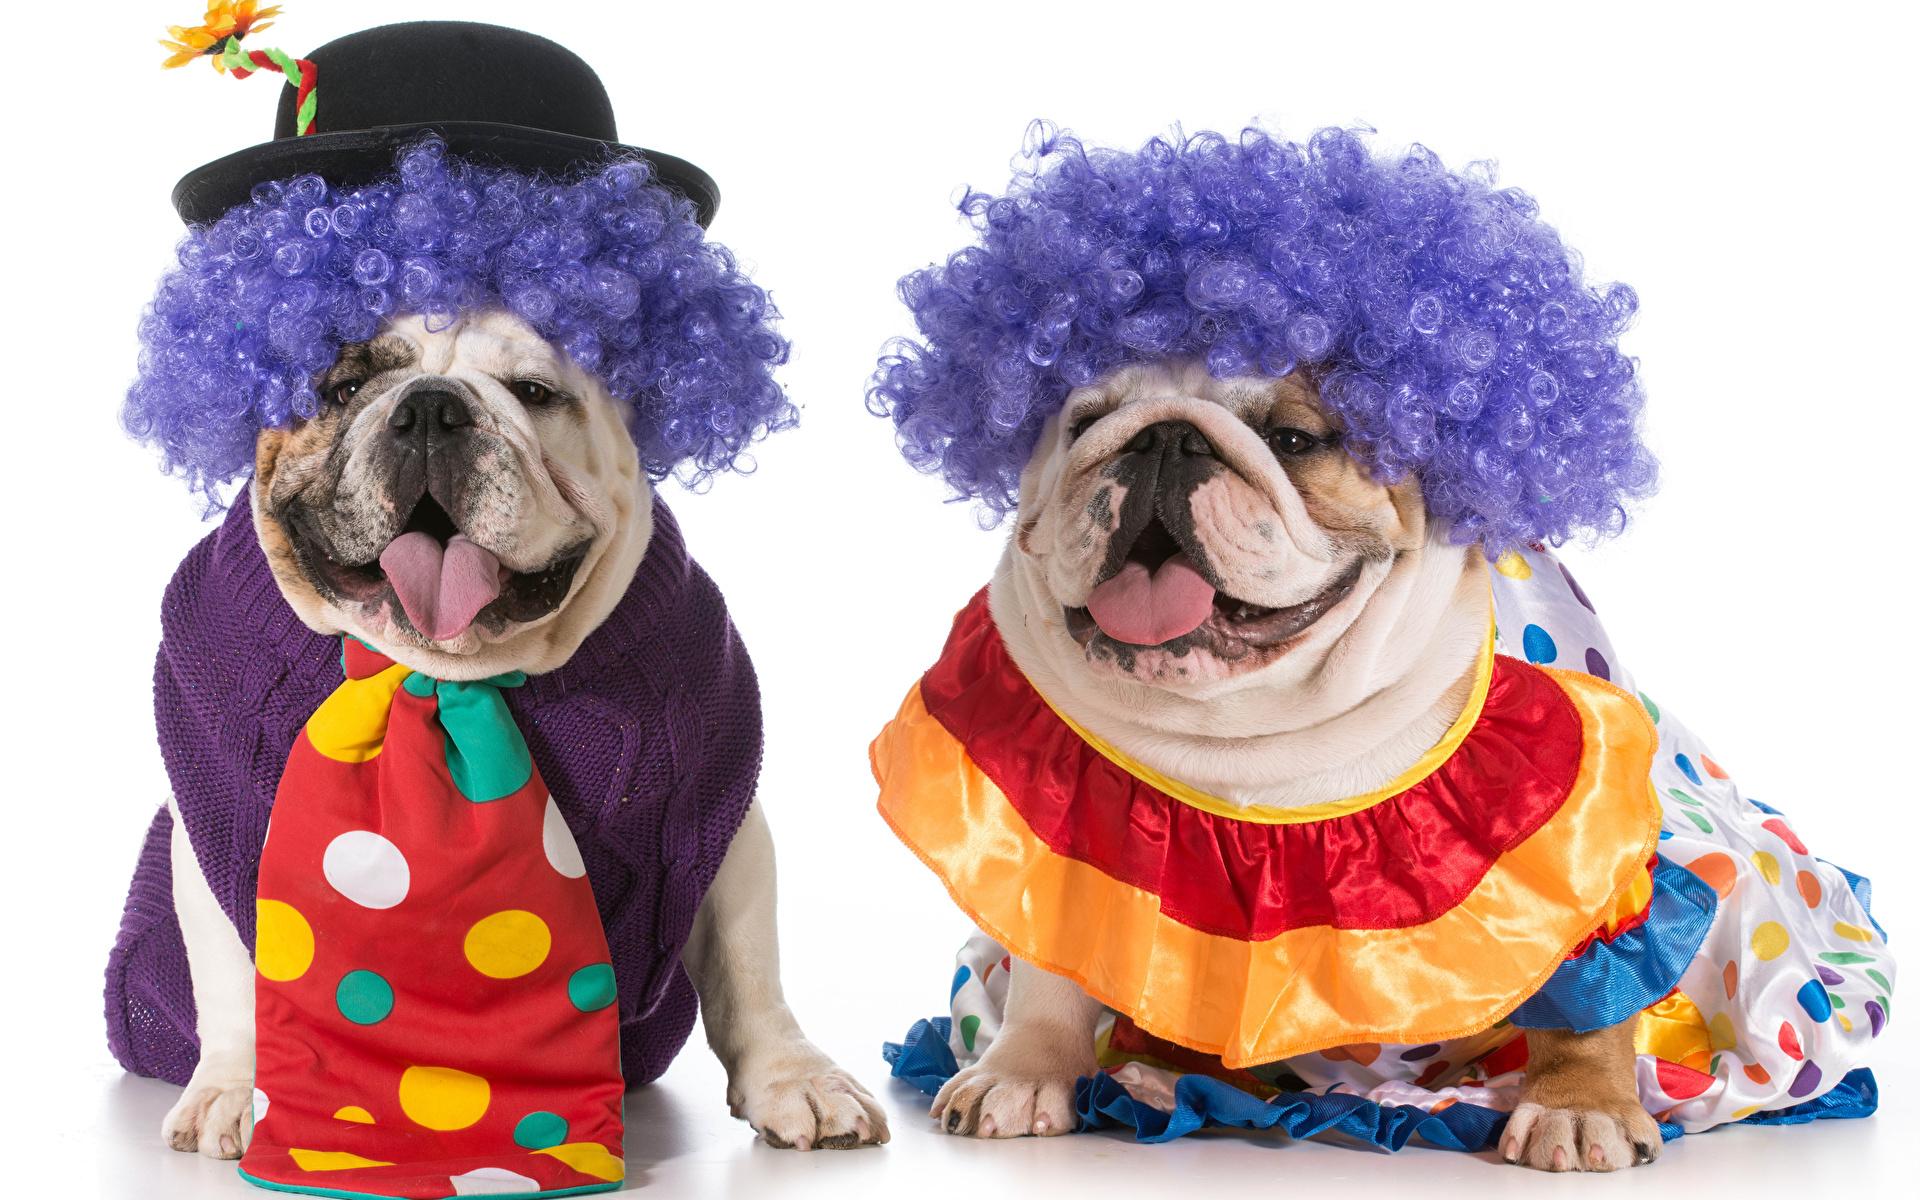 Pictures Bulldog Dogs Clown Two Hat Hair Necktie animal White background 1920x1200 dog clowns 2 Animals